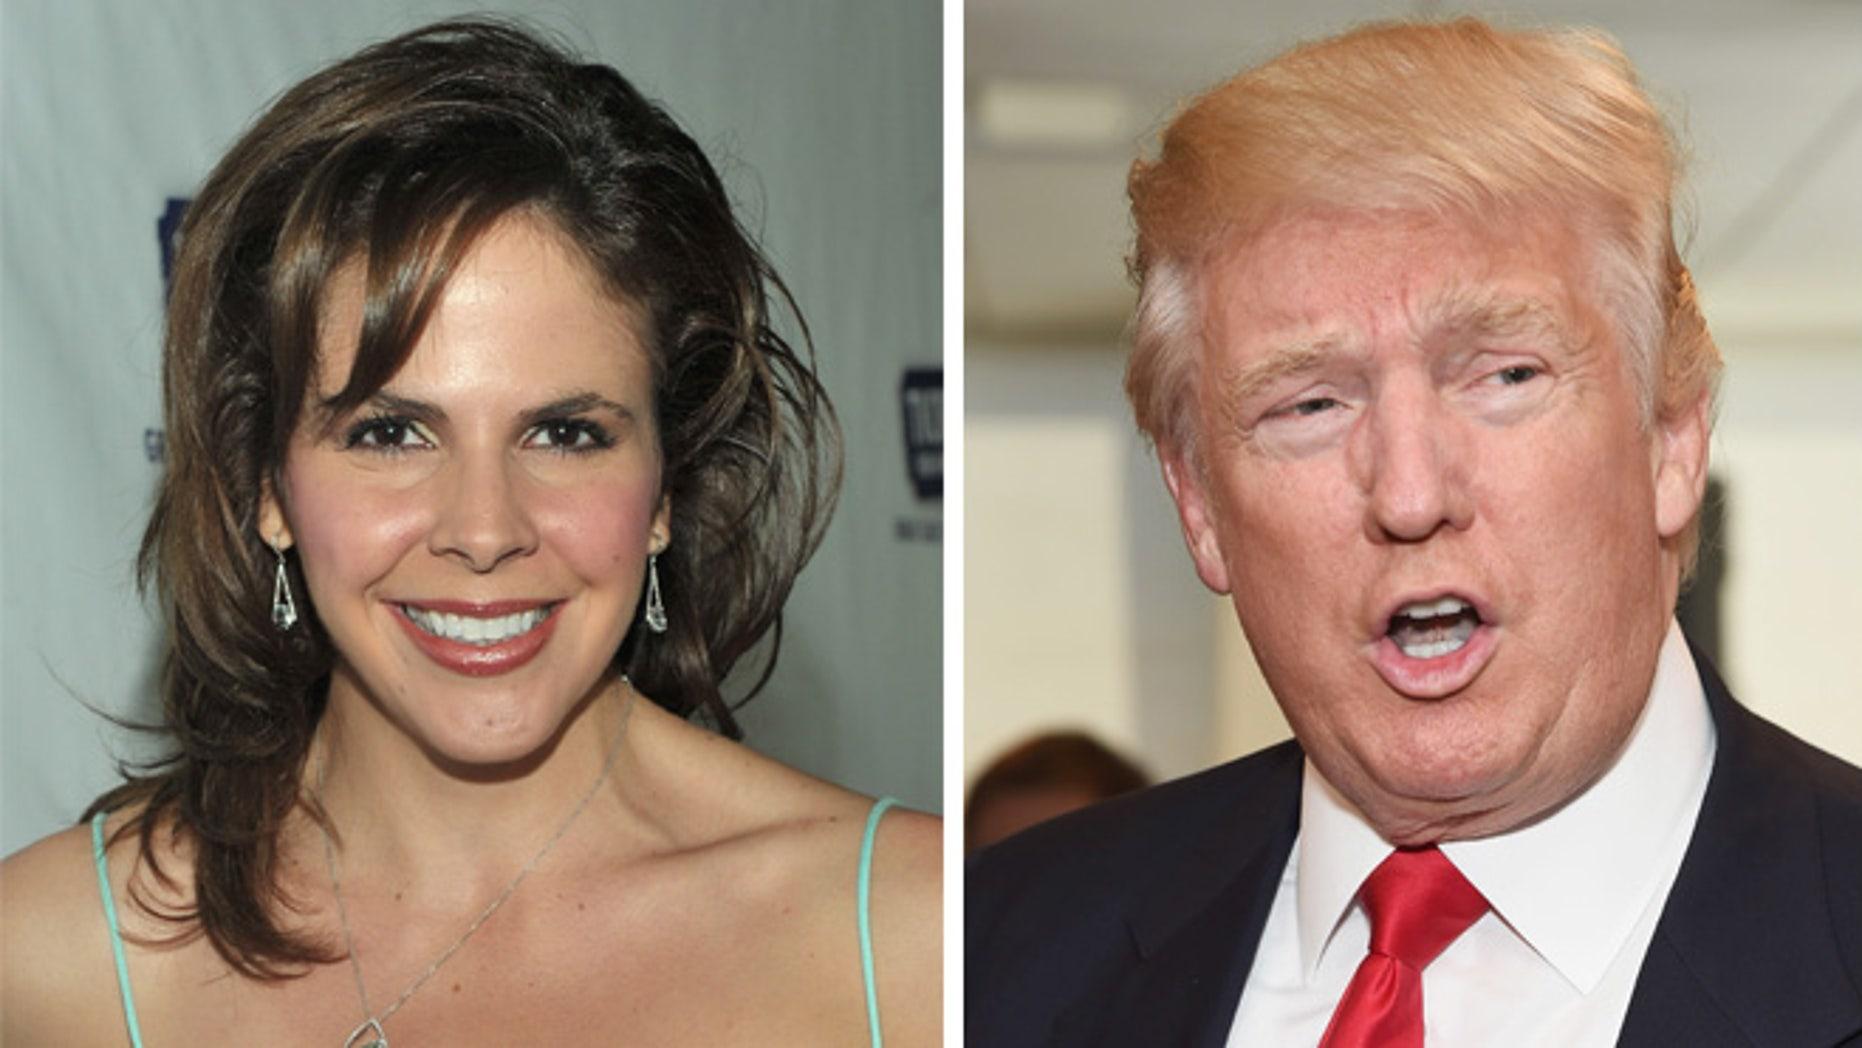 Former Miss Arizona and Miss USA contestant Tasha Dixon, left, and Donald Trump. (Photos: Getty Images)